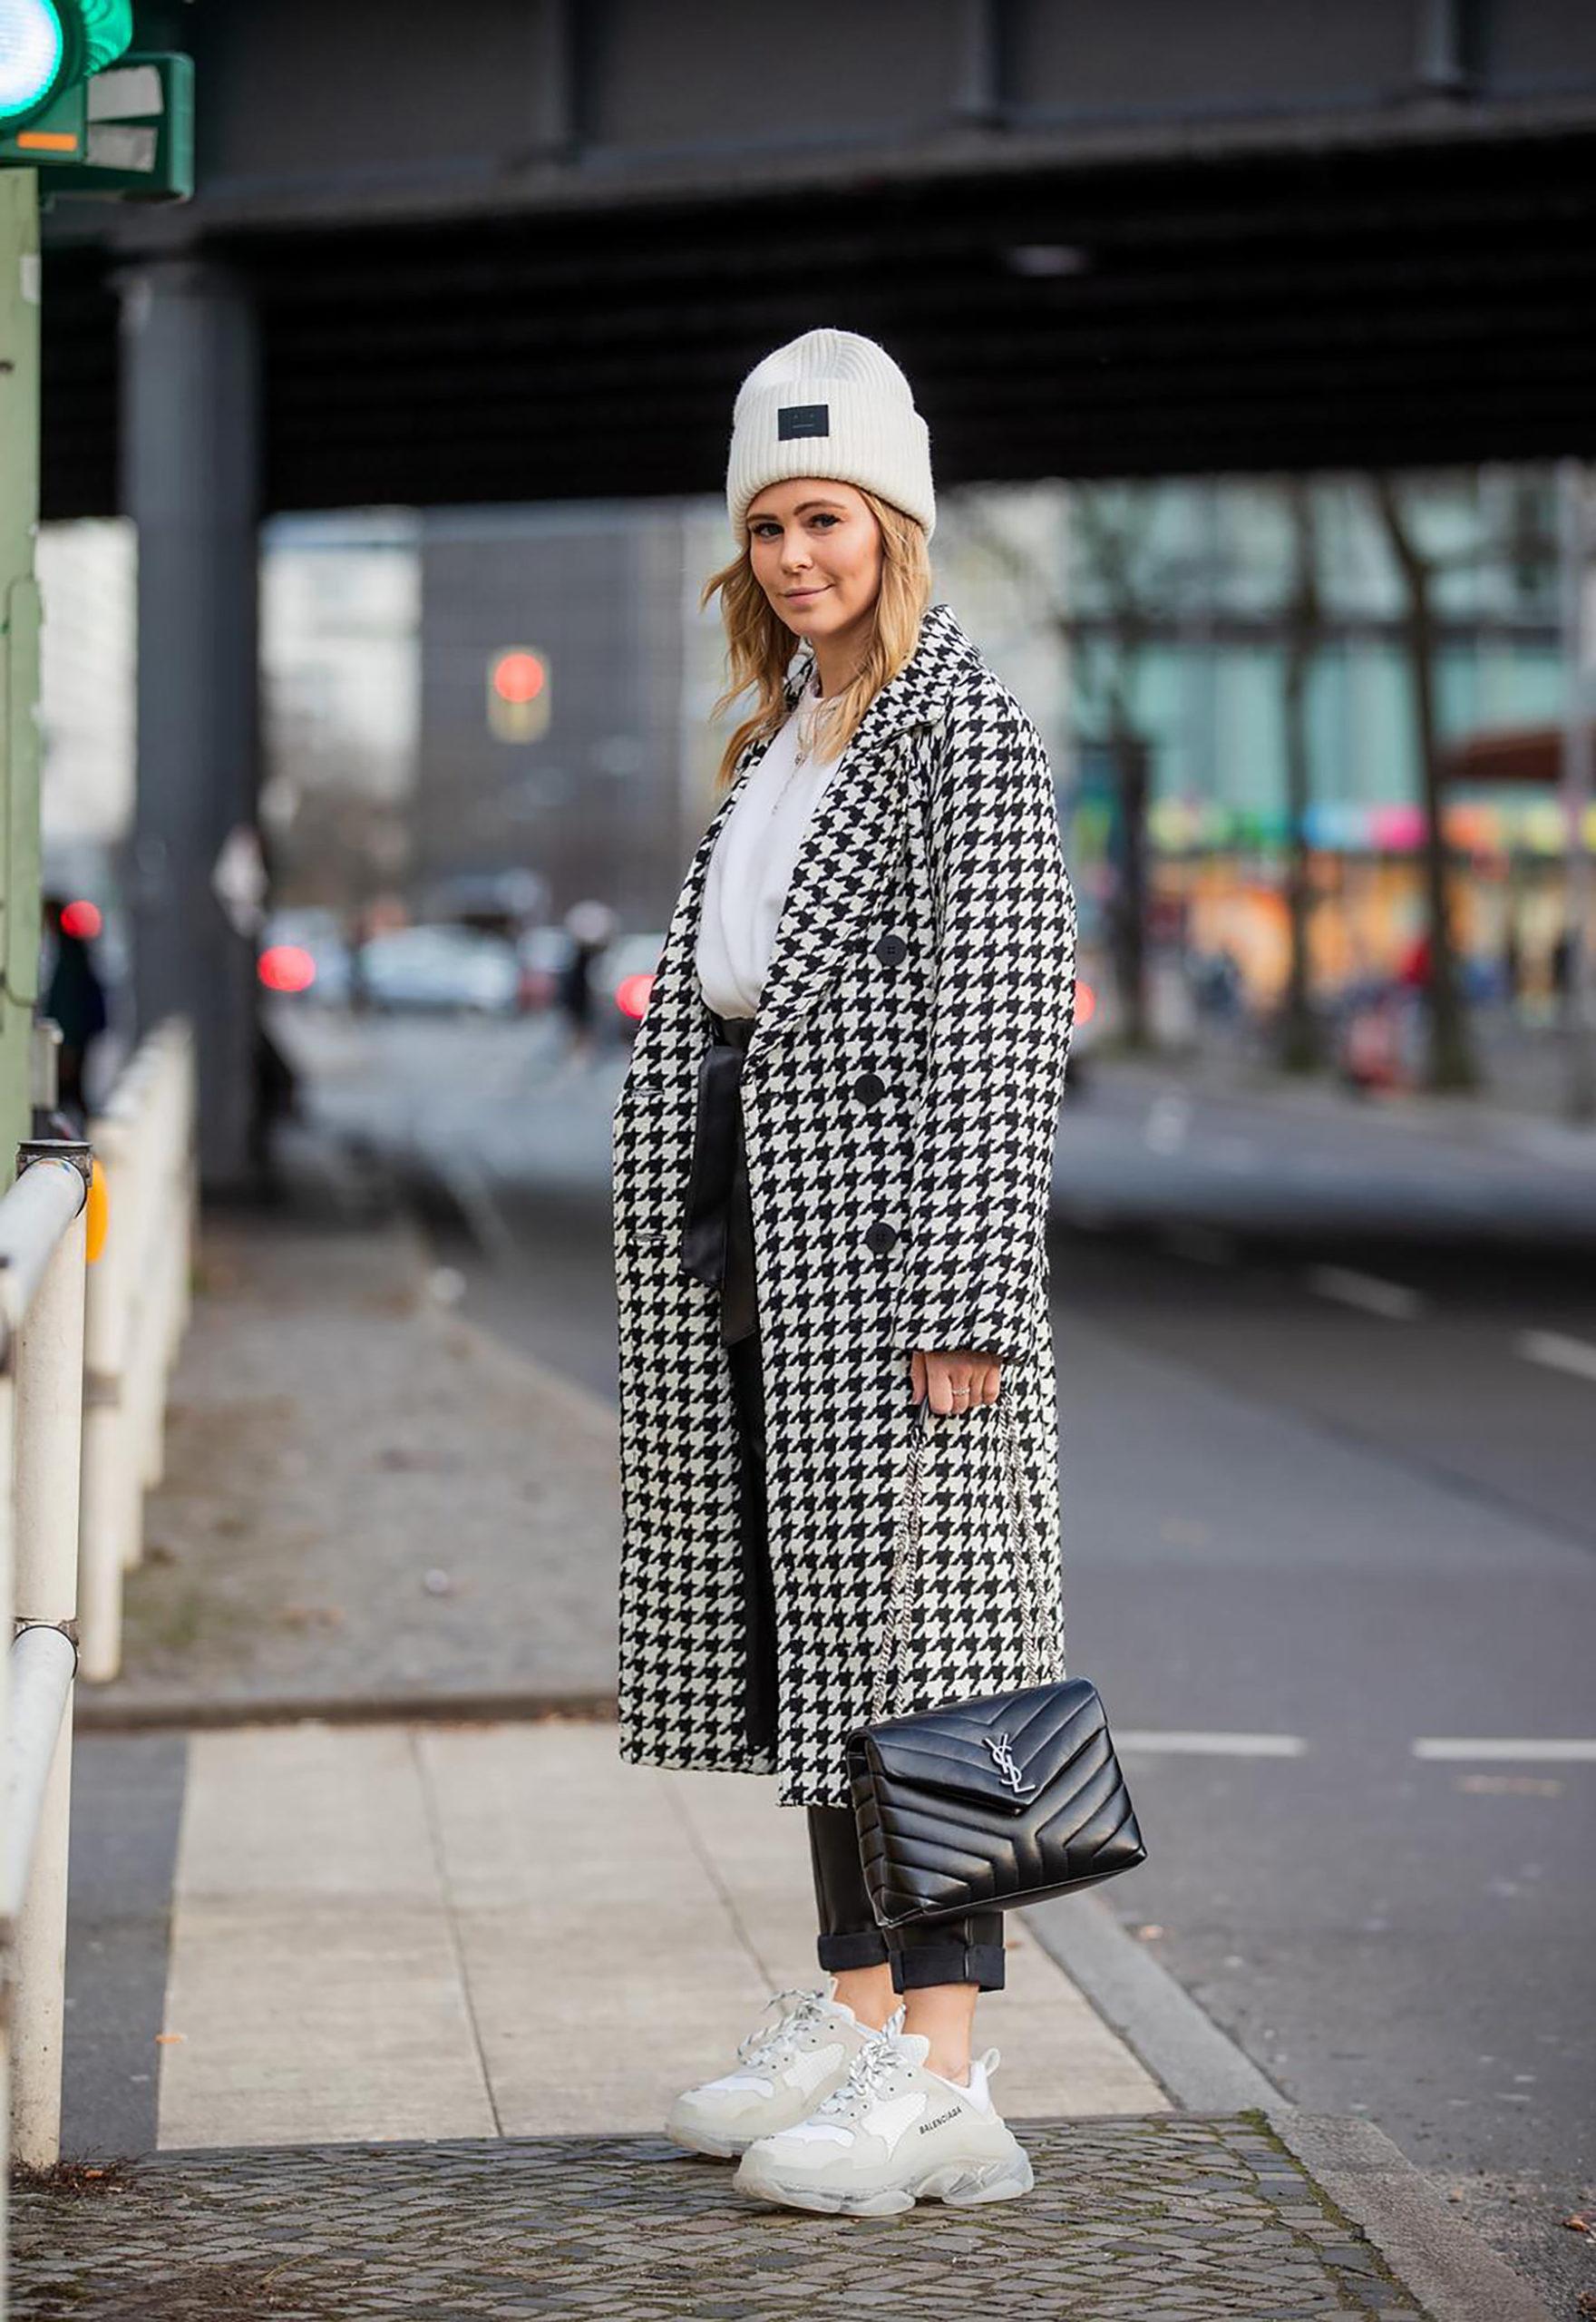 inga brauer fashion blogger düsseldorf street style outfit